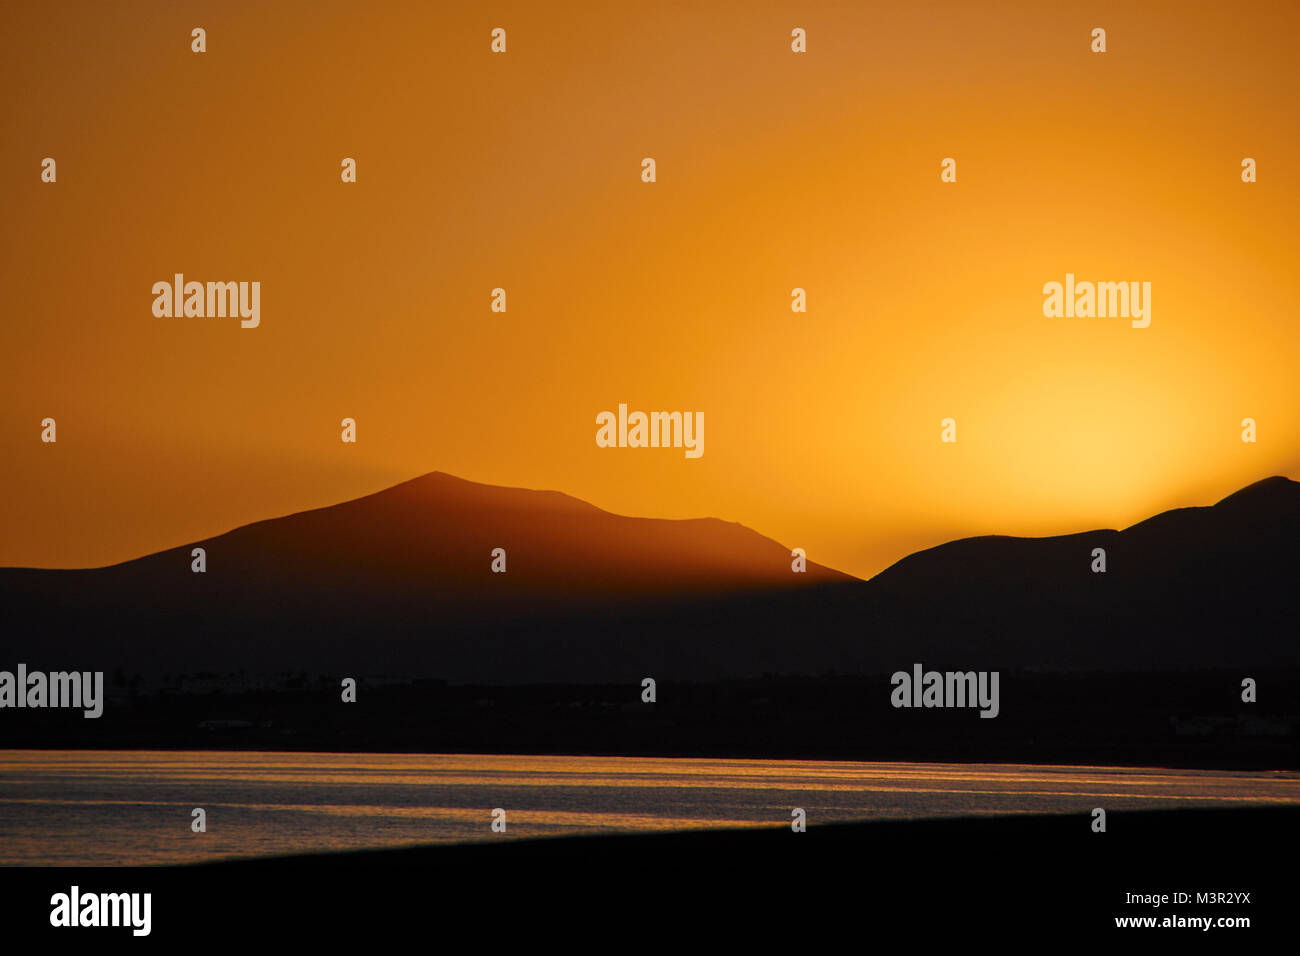 Sonnenuntergang in Arrecife, Lanzarote Stockbild